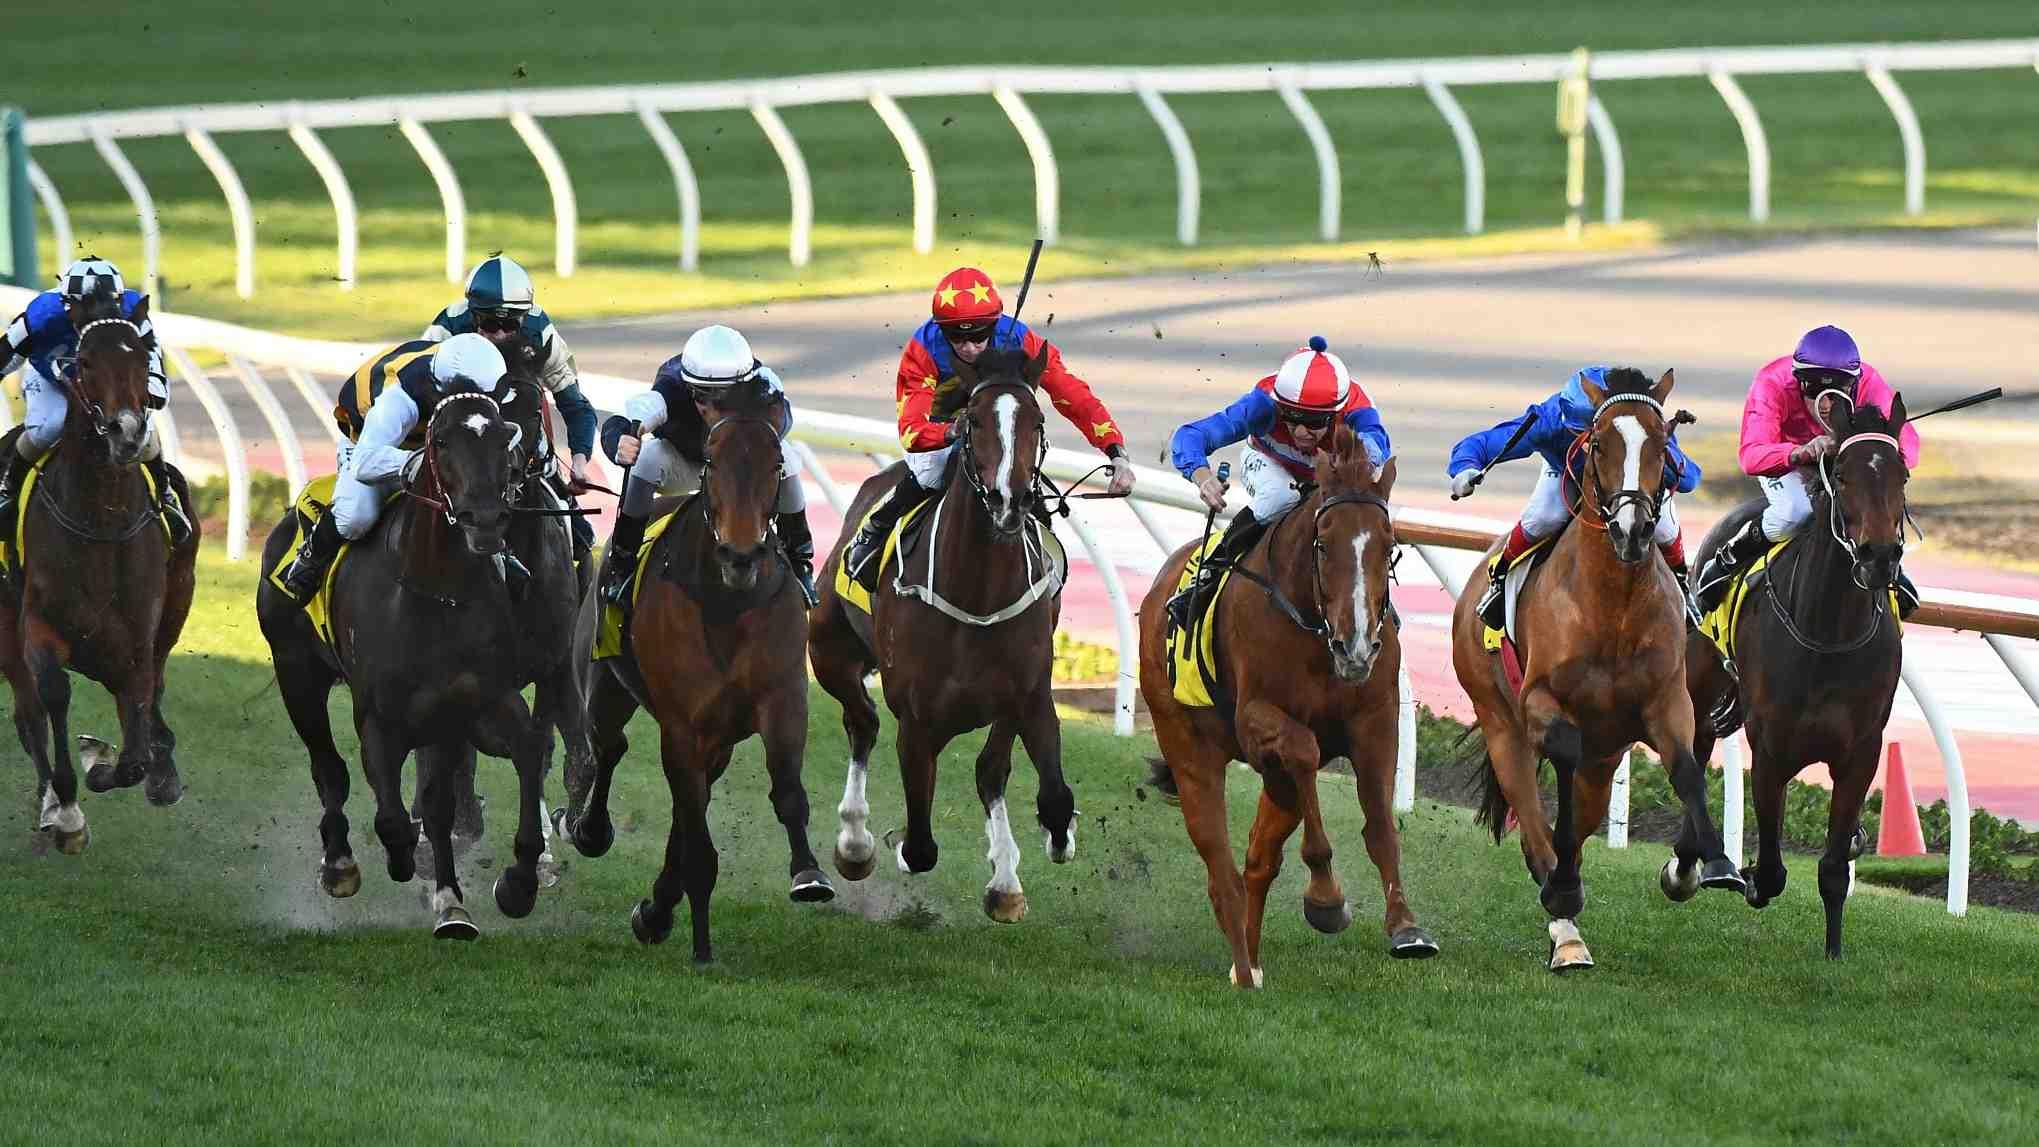 Horse racing in Hainan – China's own Kentucky Derby - CGTN